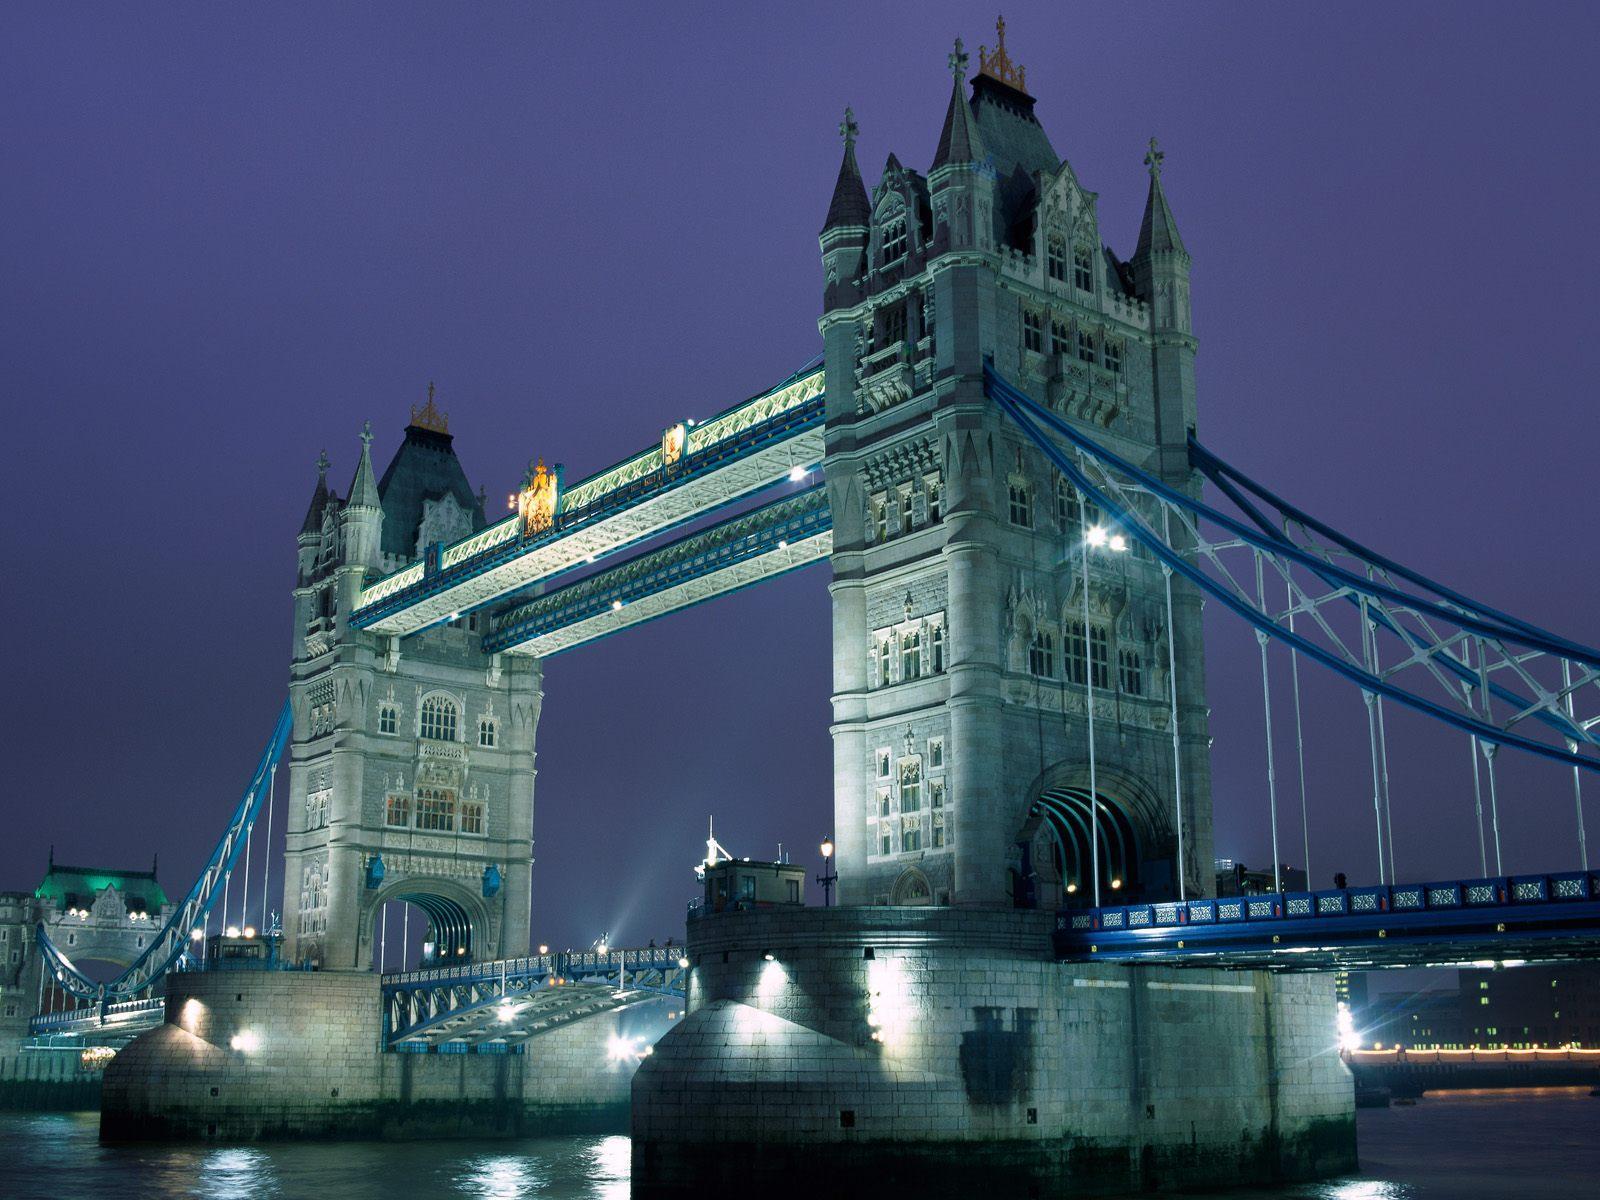 Tower Bridge London Icon Suspension Bridge River Thames 1600x1200